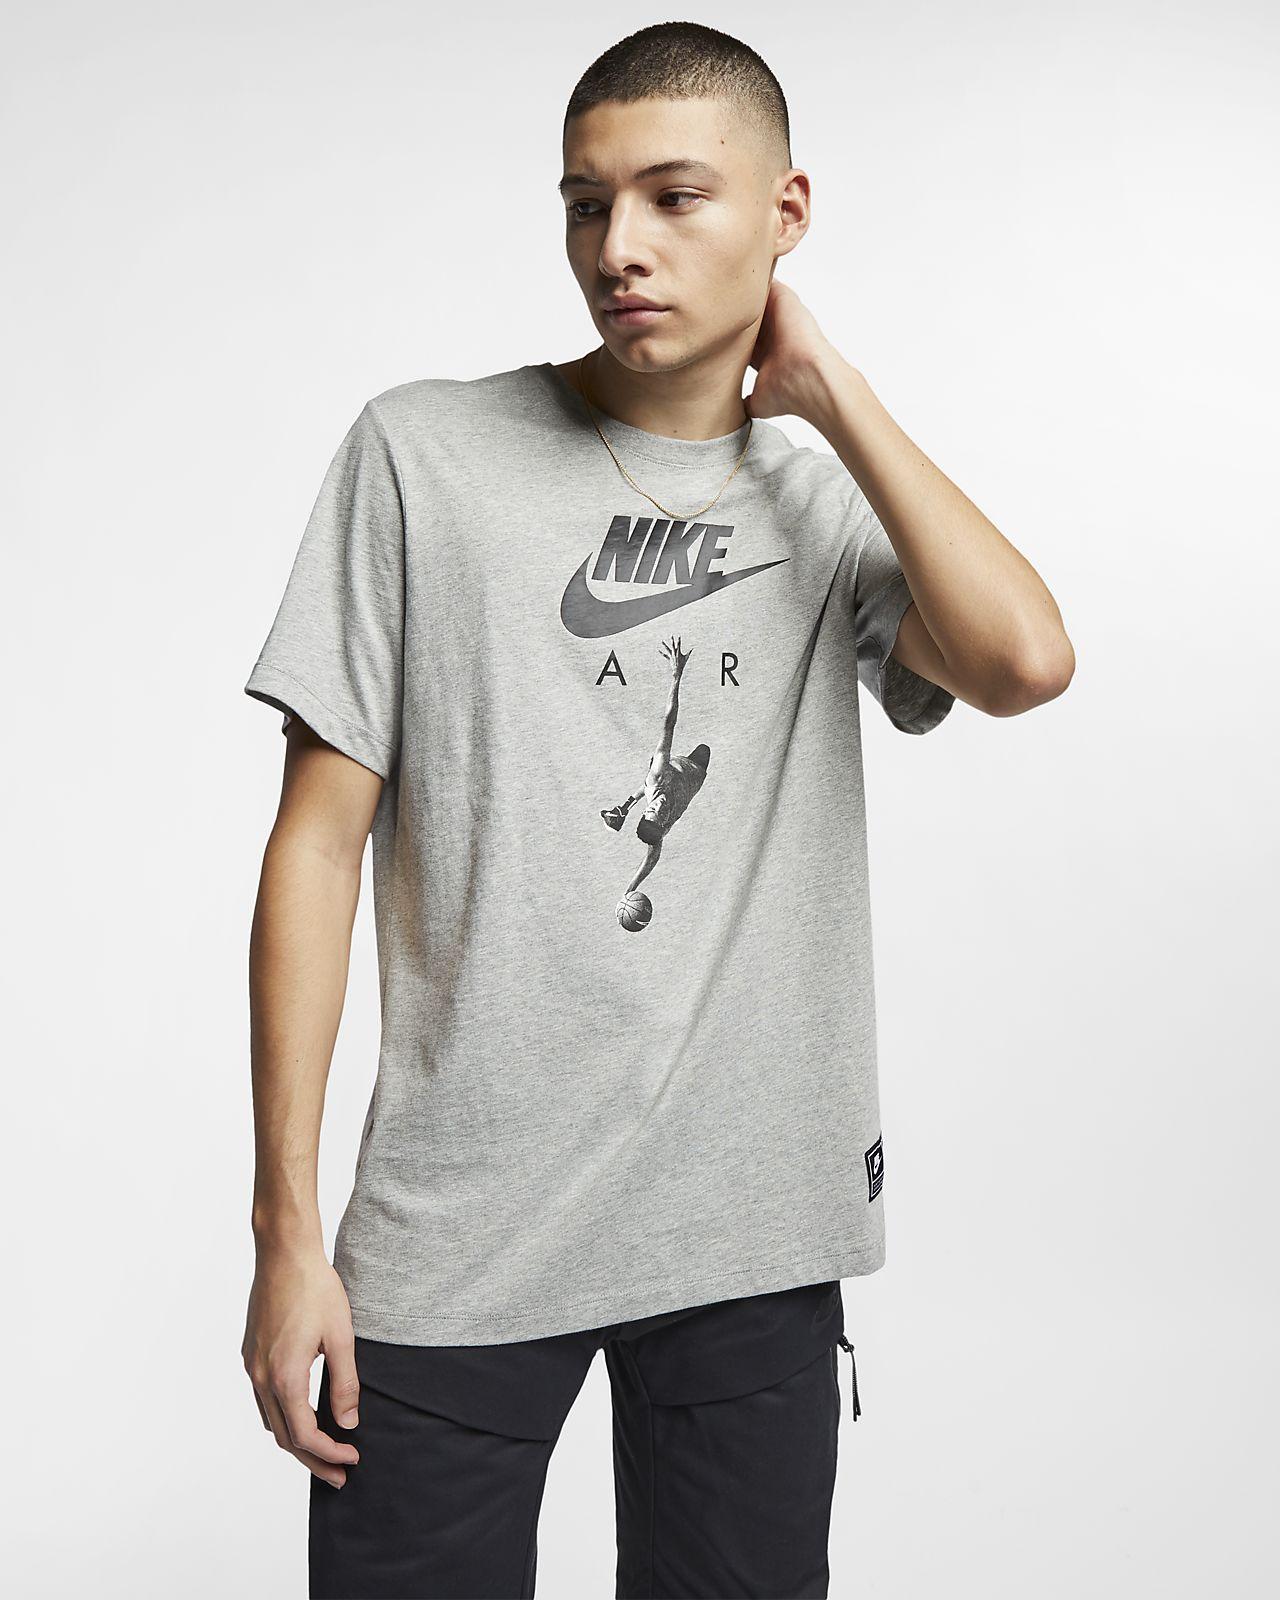 Nike Air Camiseta - Hombre